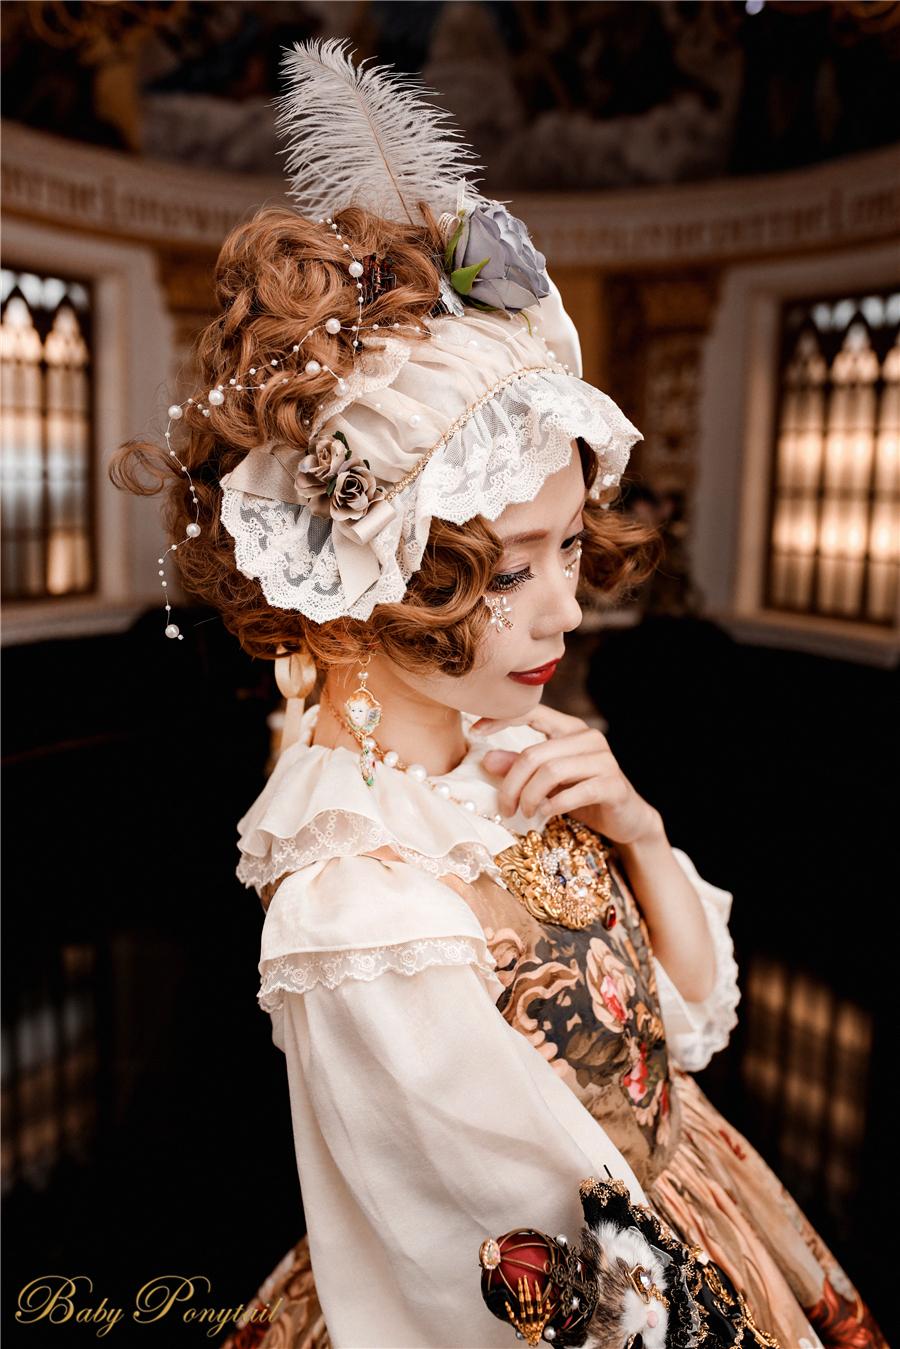 BabyPonytail_Rose Battle_Model Photo_JSK amber_Kaka_0.jpg